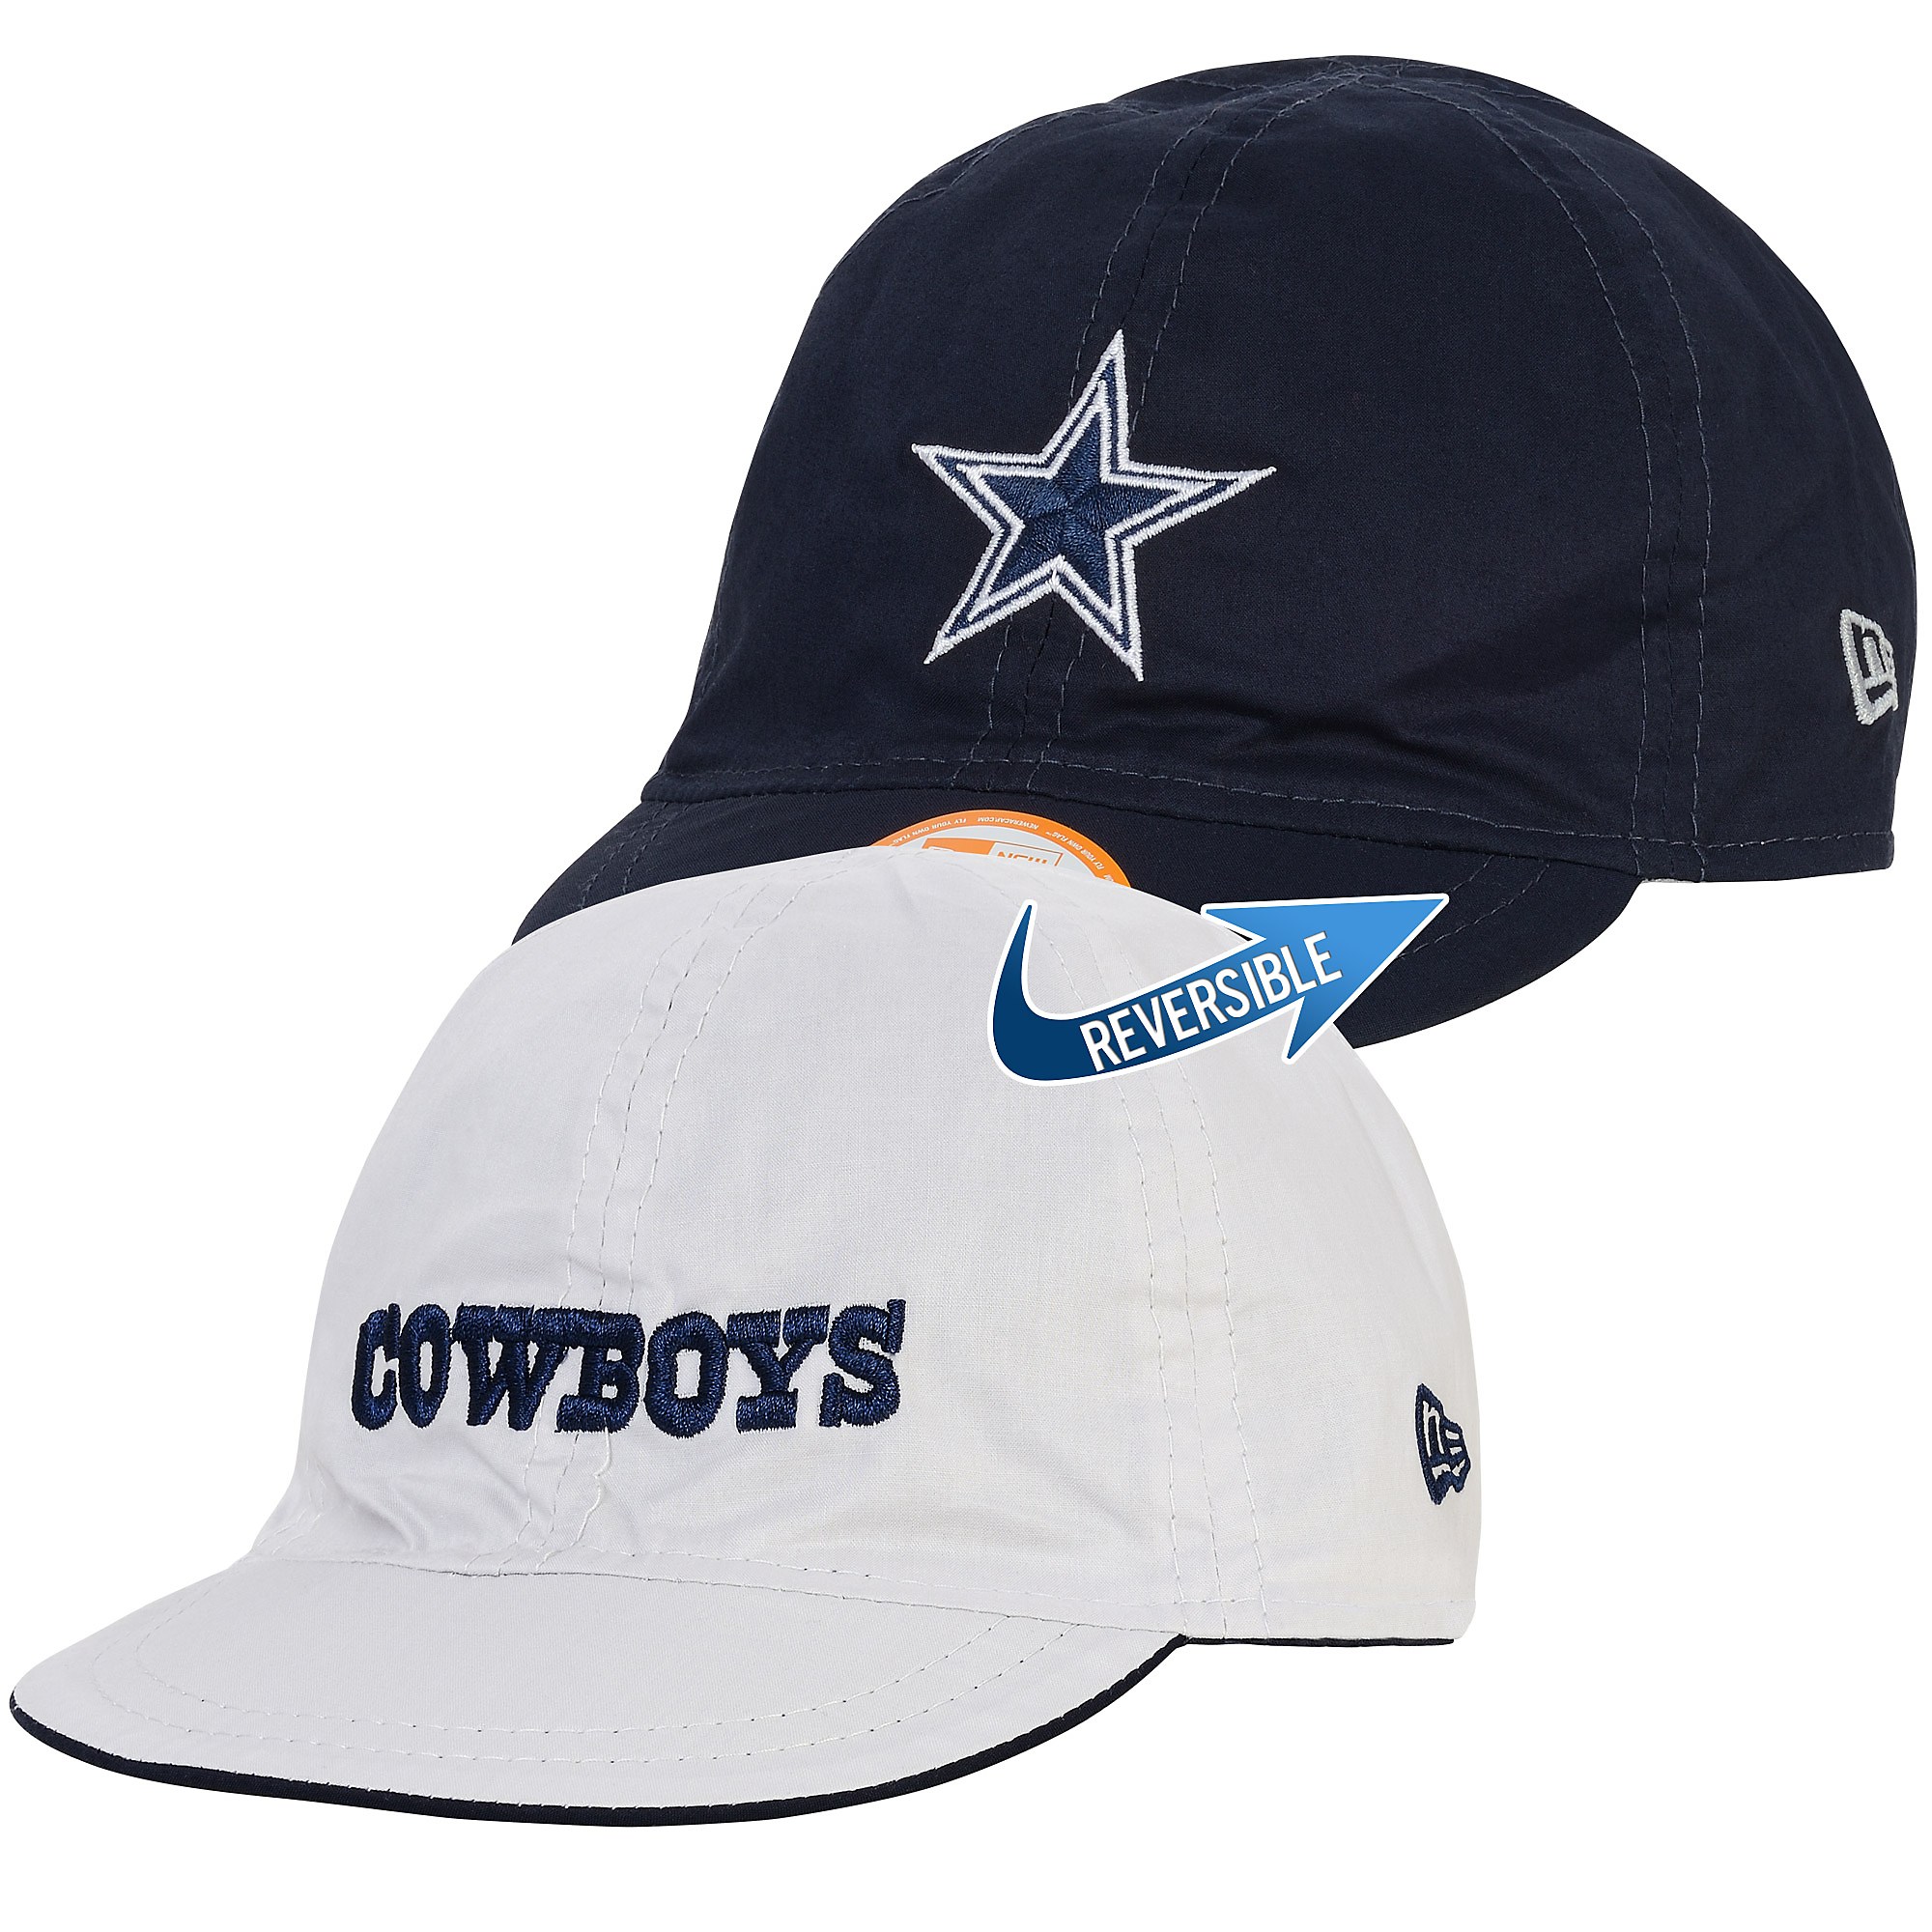 4253c0016 Dallas Cowboys New Era Reversible MVP In Training 9Twenty Cap